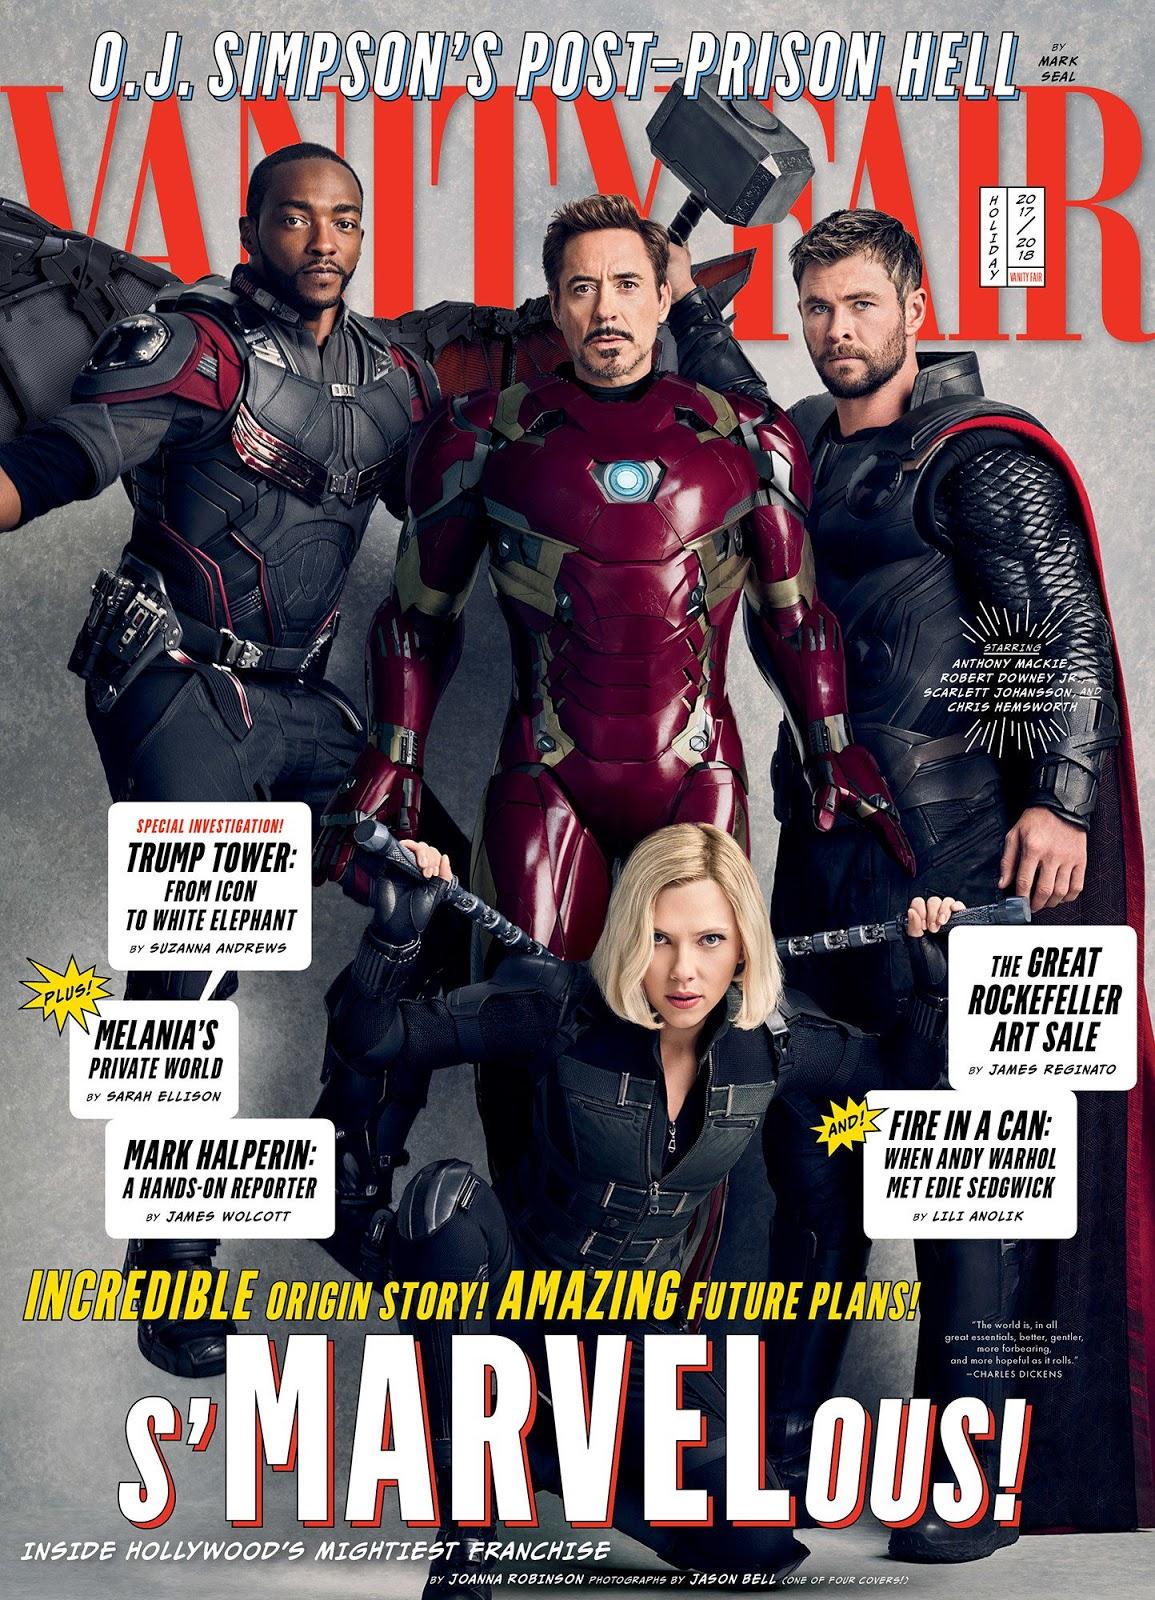 Vanity Fair 2017 Marvel Cover 1